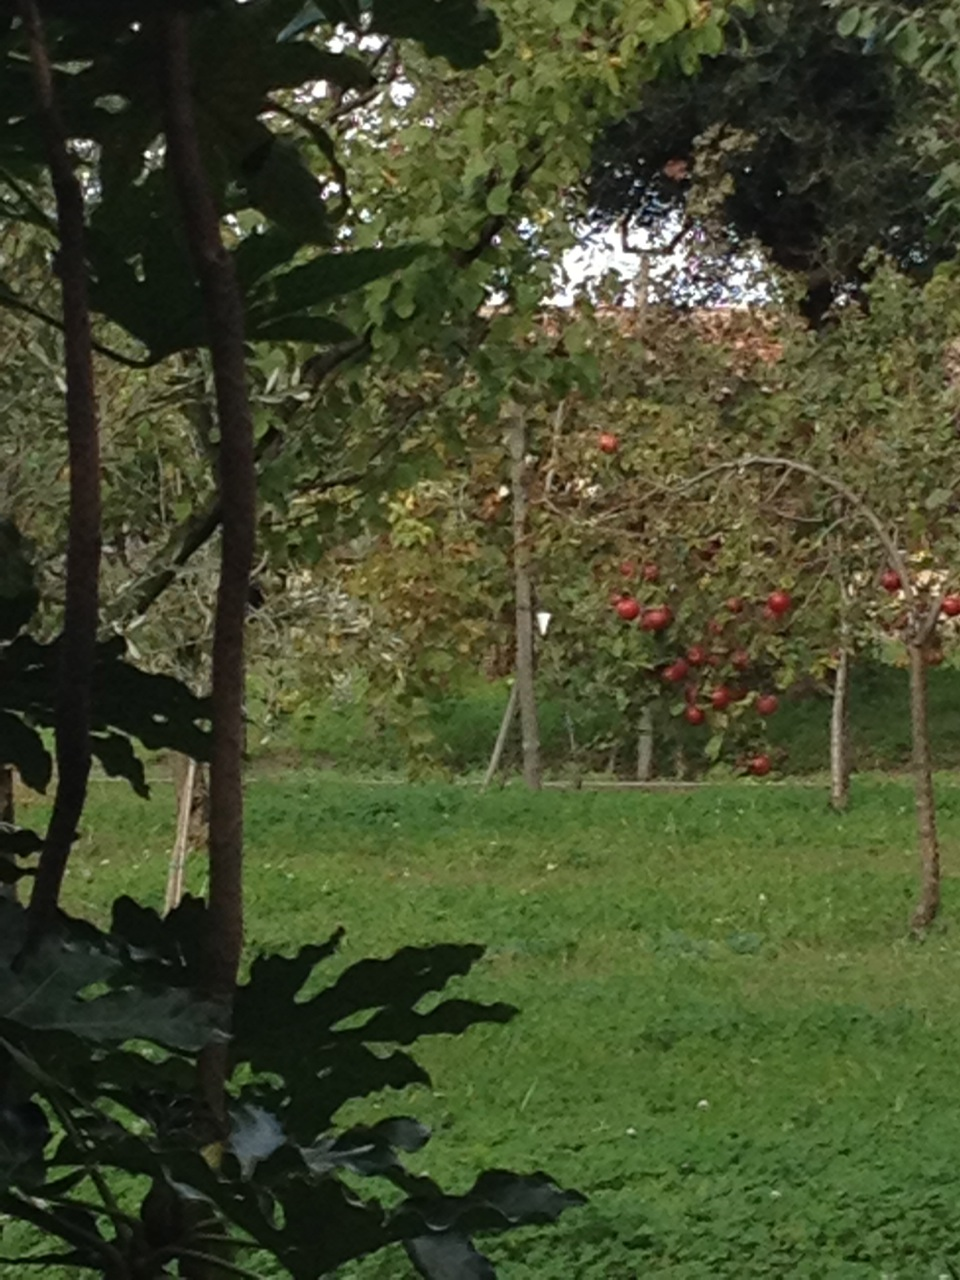 Le potager de S. Francesco della Vigna avec un arbre fruitier